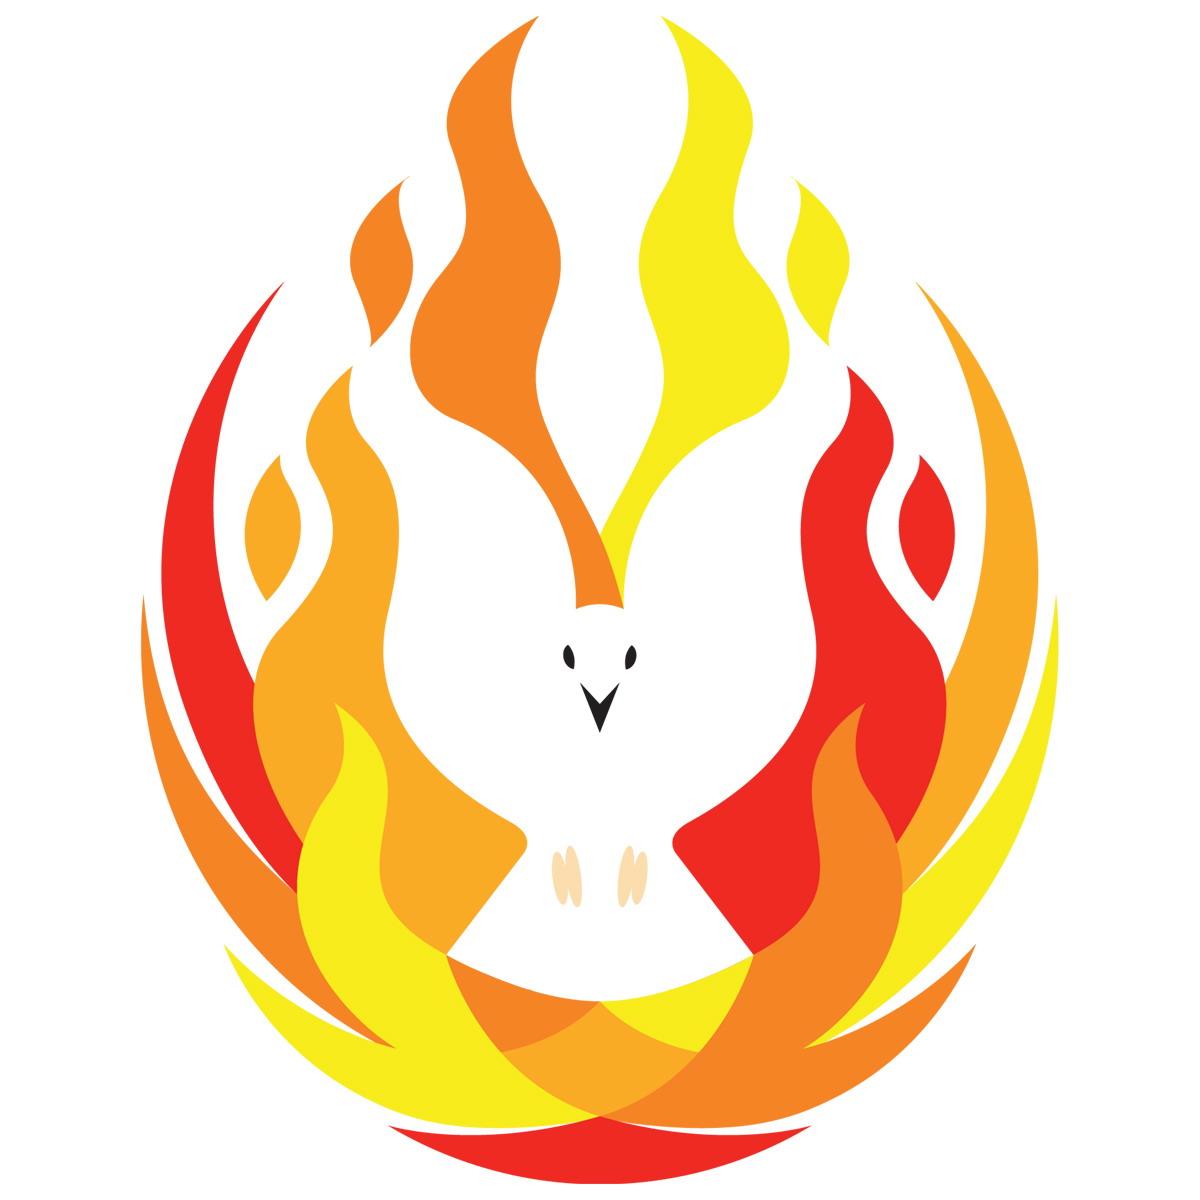 Holy Spirit Dove Symbol Free Image